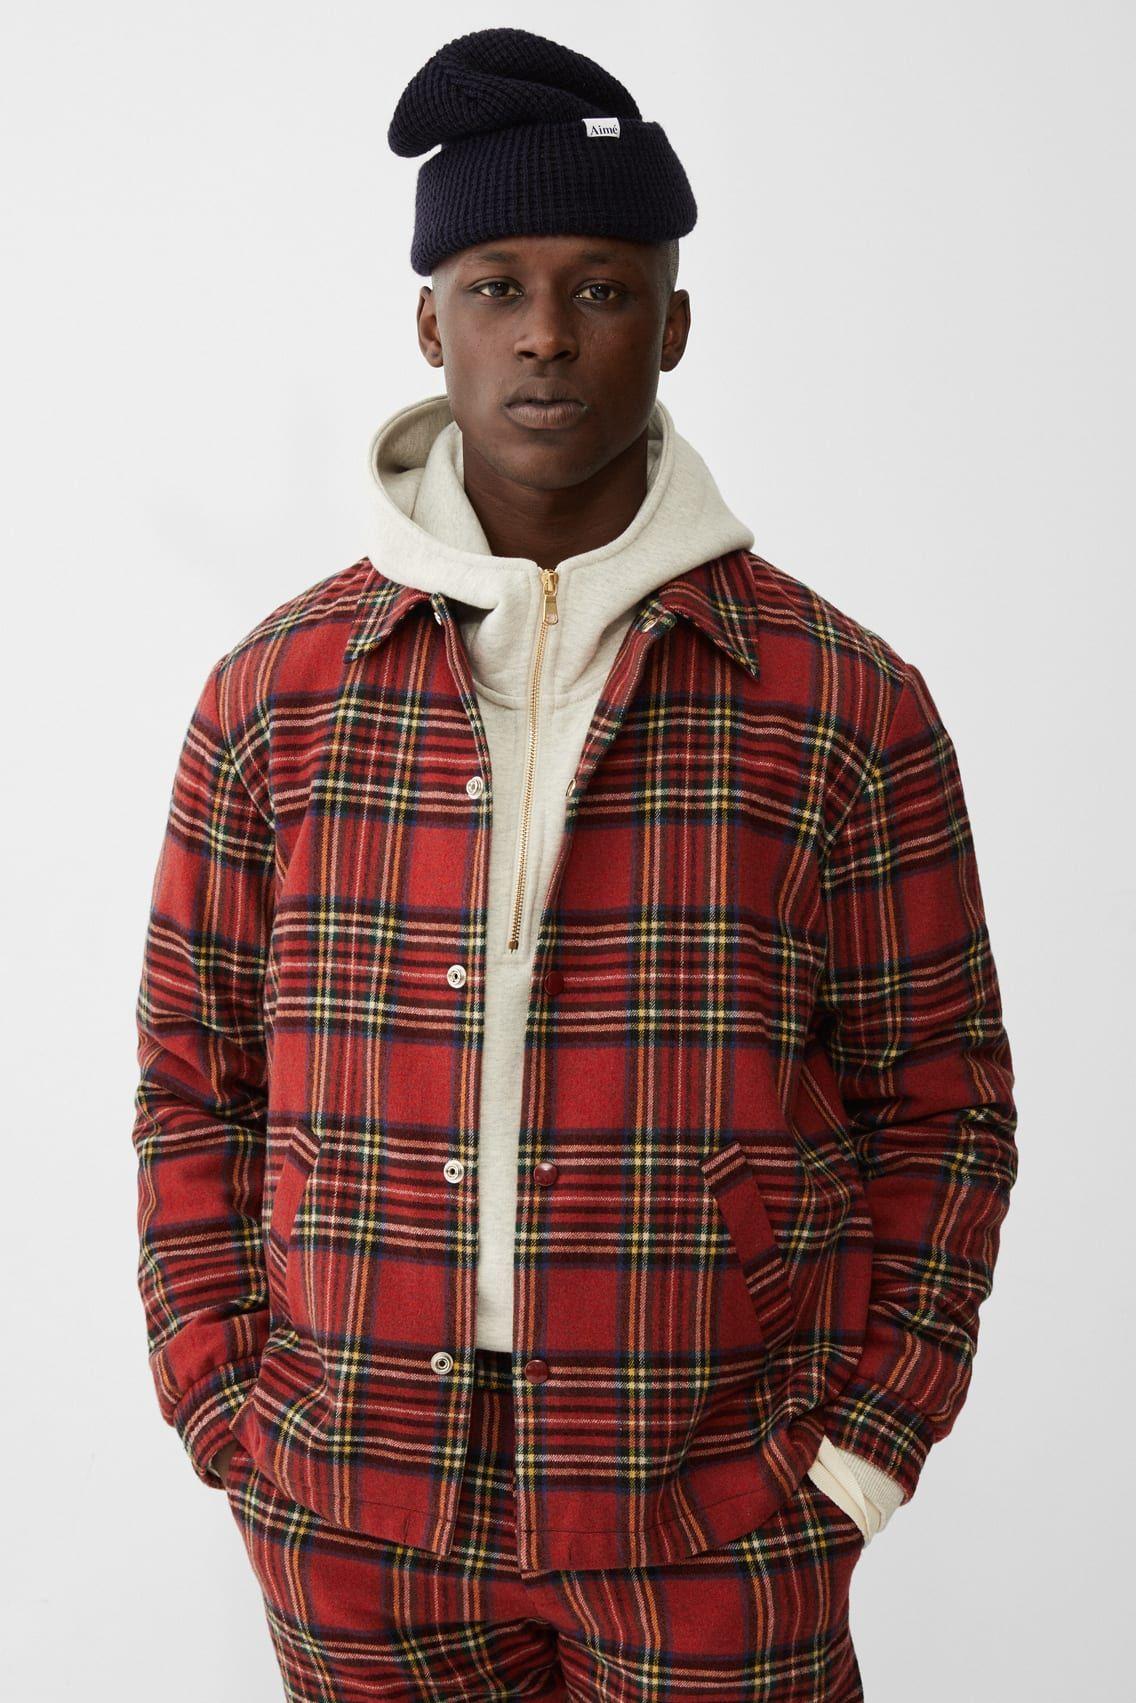 48fc8fe63f1f4 Aimé Leon Dore Unveils Lookbook for Fall Winter 2017 Collection ...